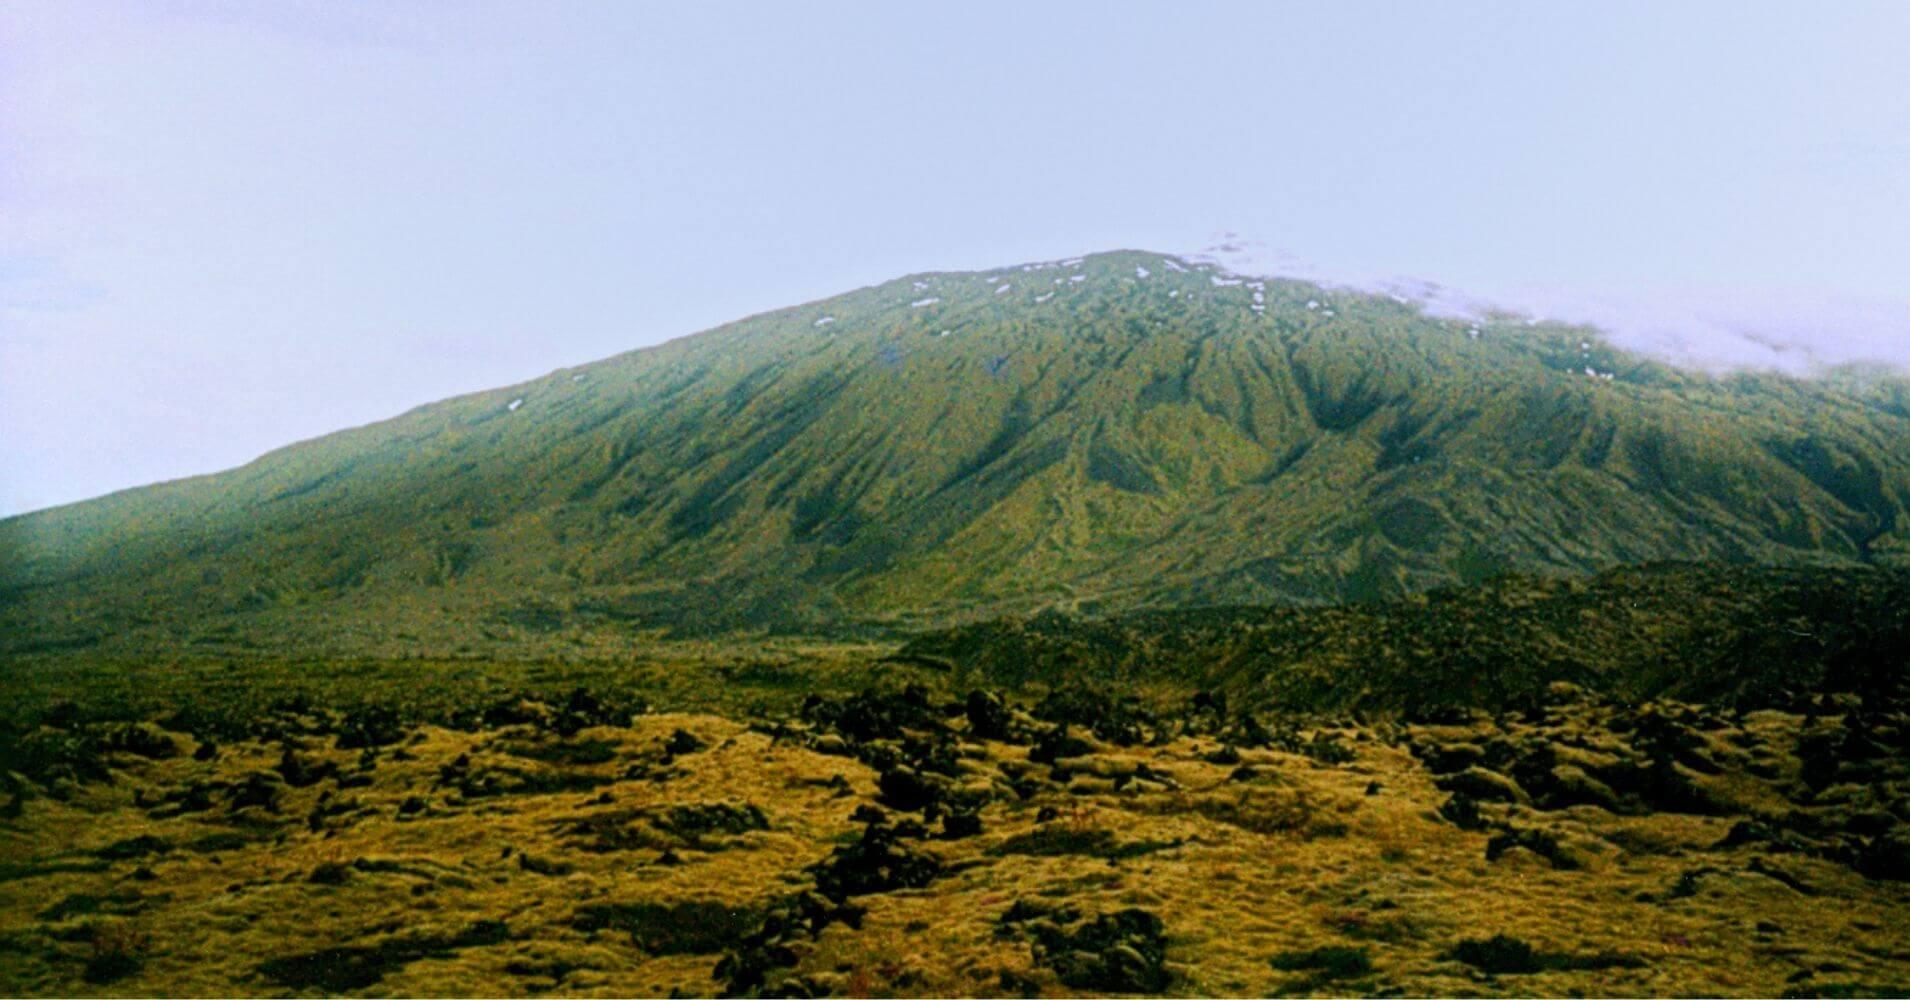 El Parque Nacional Volcán Snaefells Snæfellsjökull. Vesturland, Islandia.